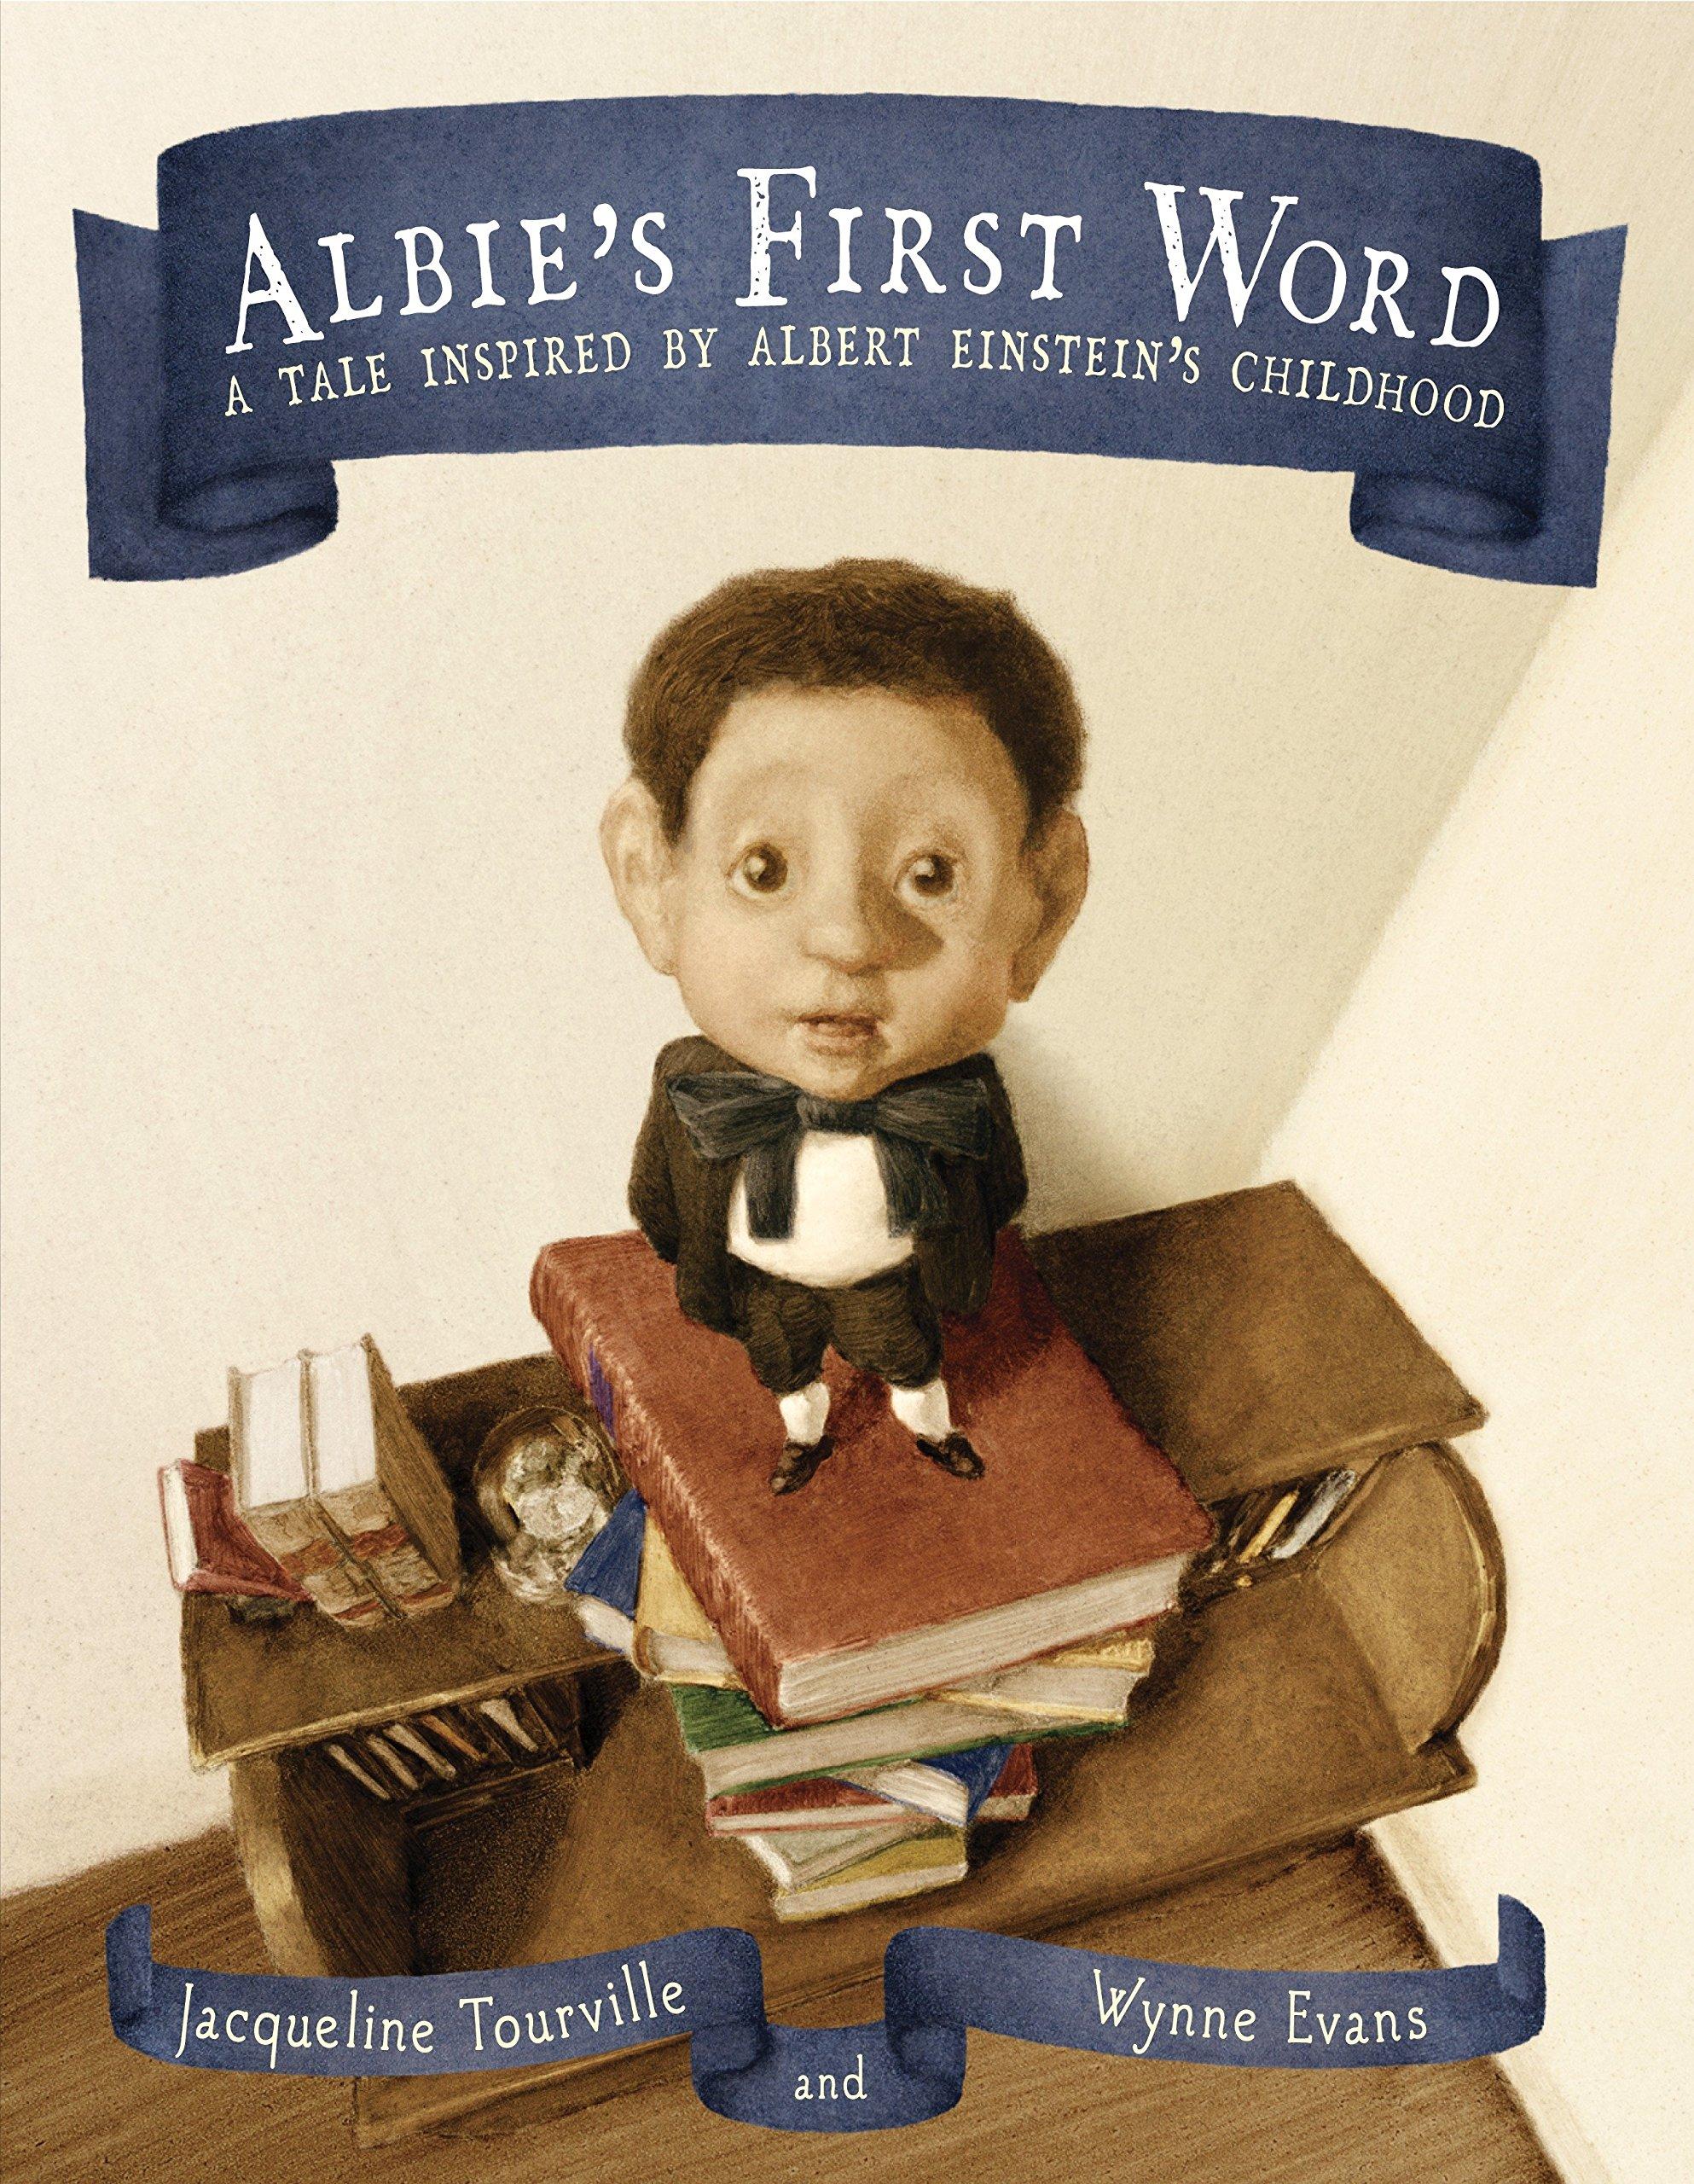 Albie's First Word: A Tale Inspired by Albert Einstein's Childhood